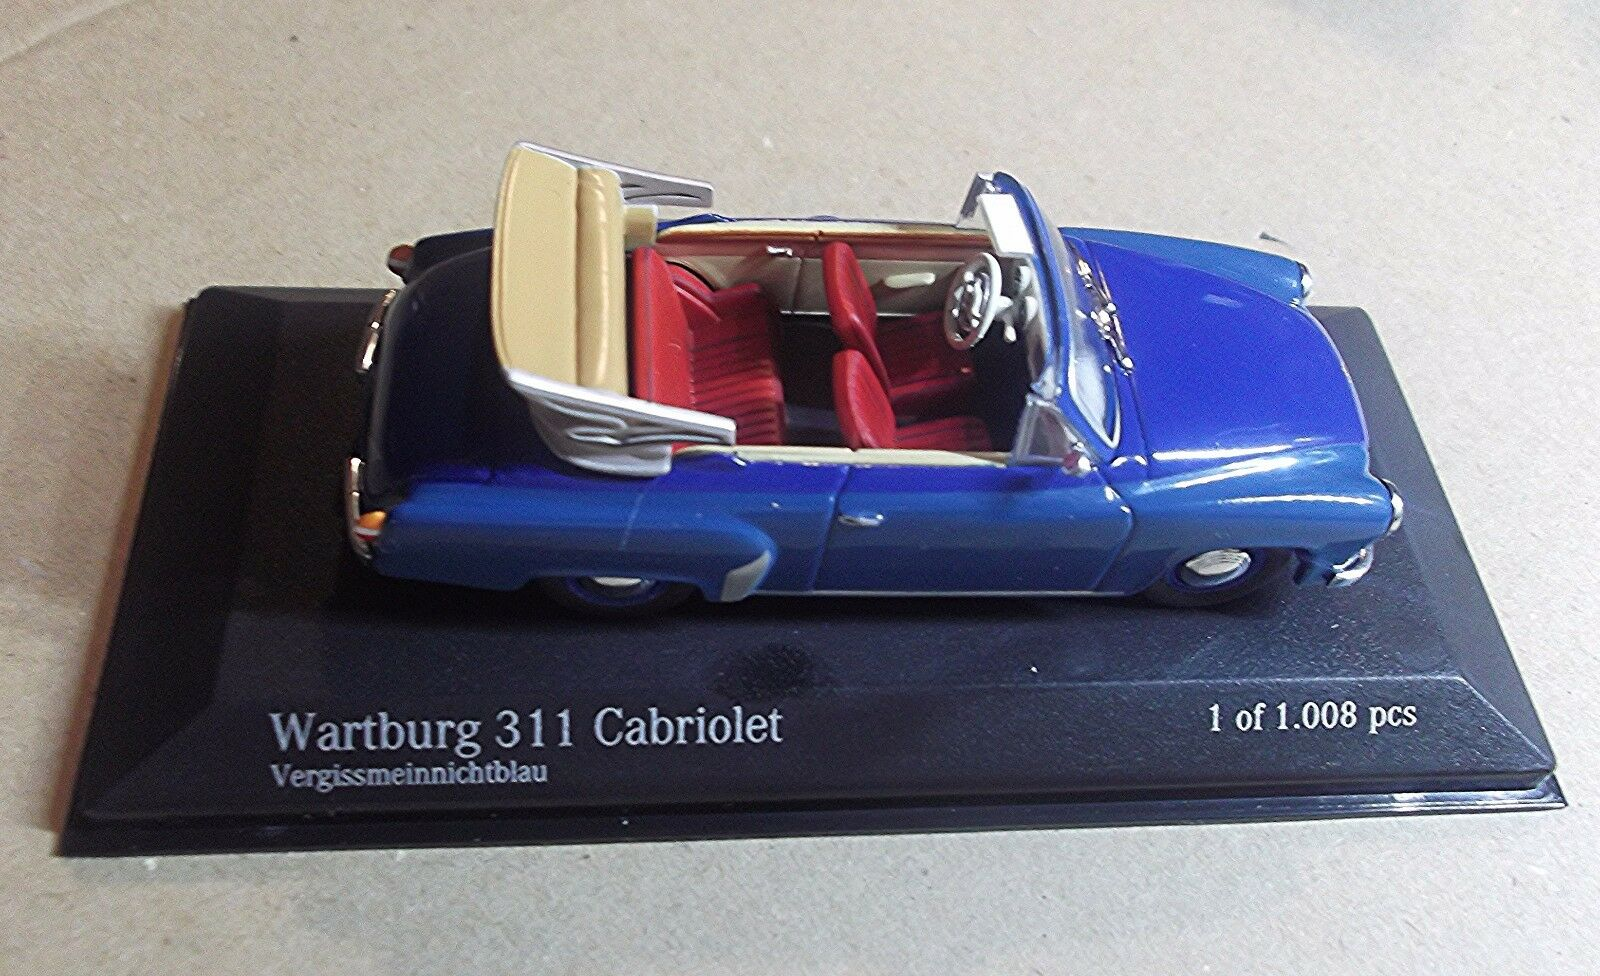 43015932  MINICHAMPS 1 43 SCALE  WARTBURG 311 2 CABRIOLET 1959  blueE